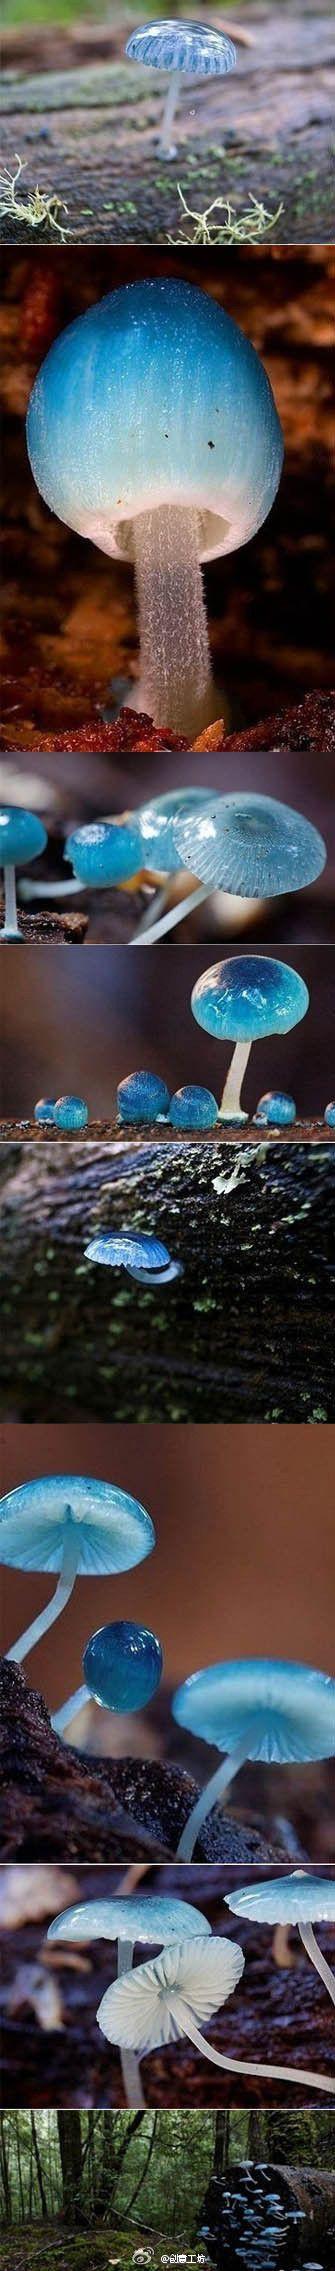 Dazzling Blue Mushroom